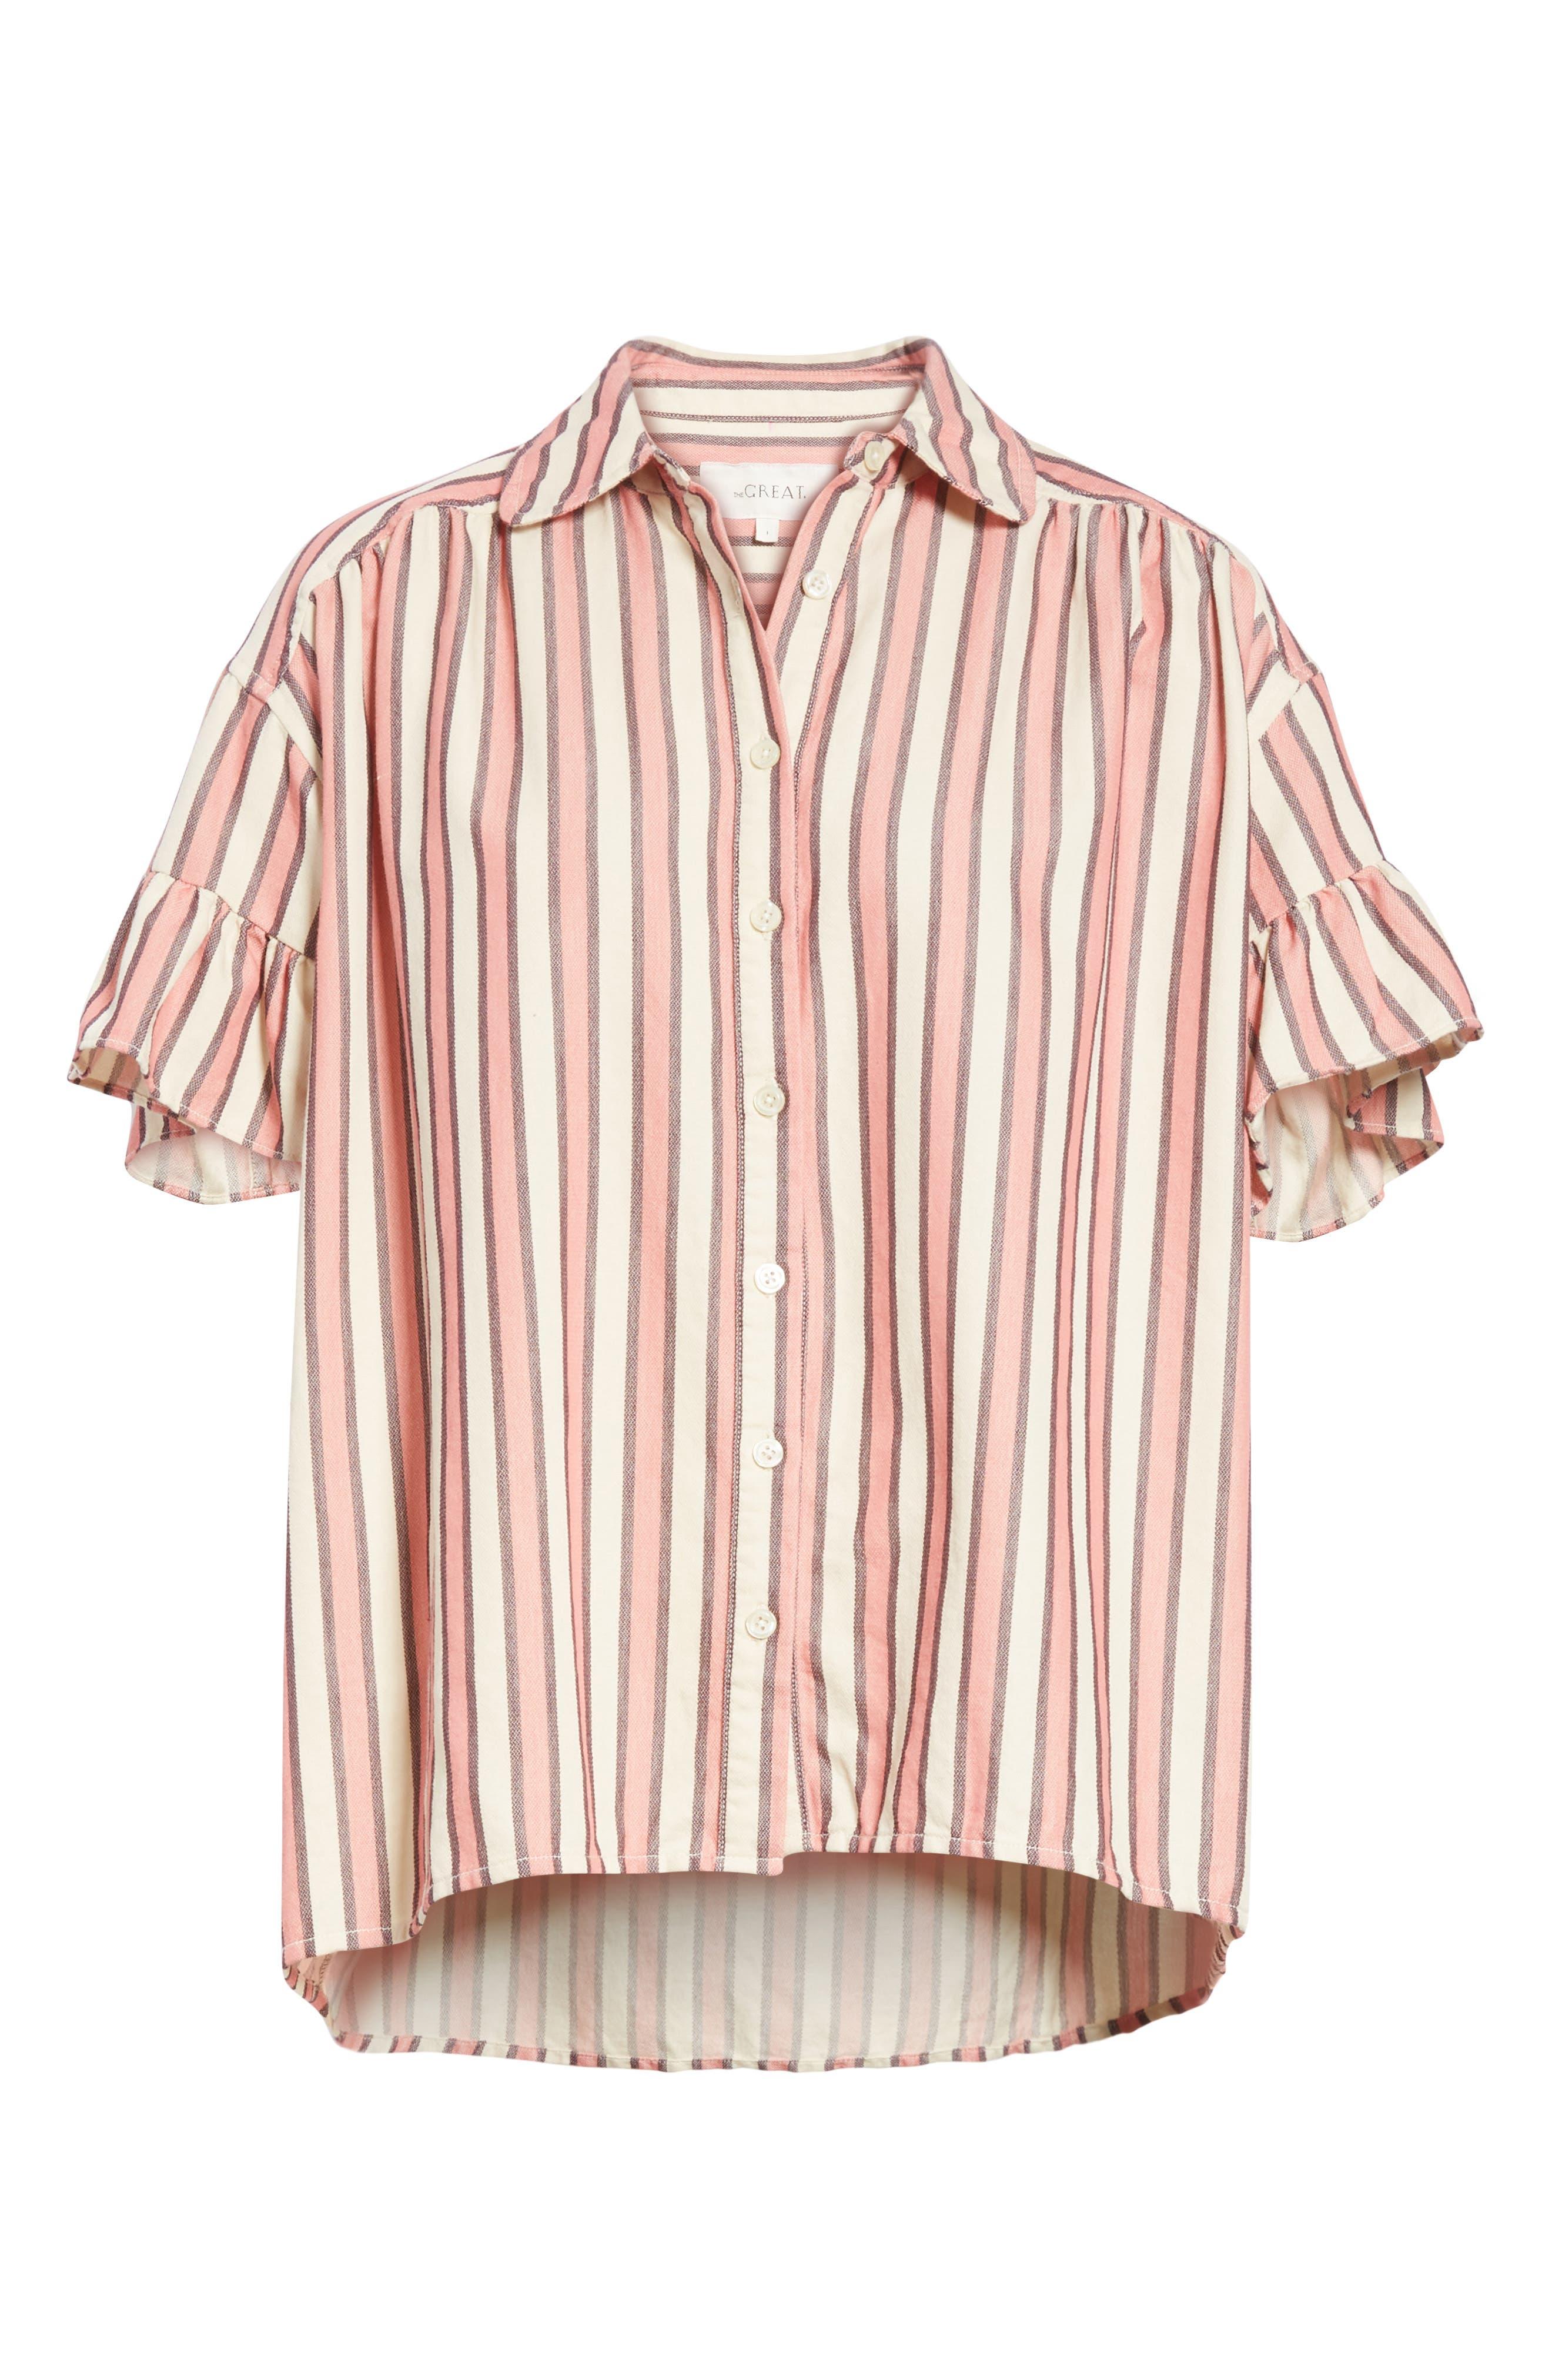 Flutter Sleeve Stripe Shirt,                             Alternate thumbnail 7, color,                             Pink Taffy Stripe